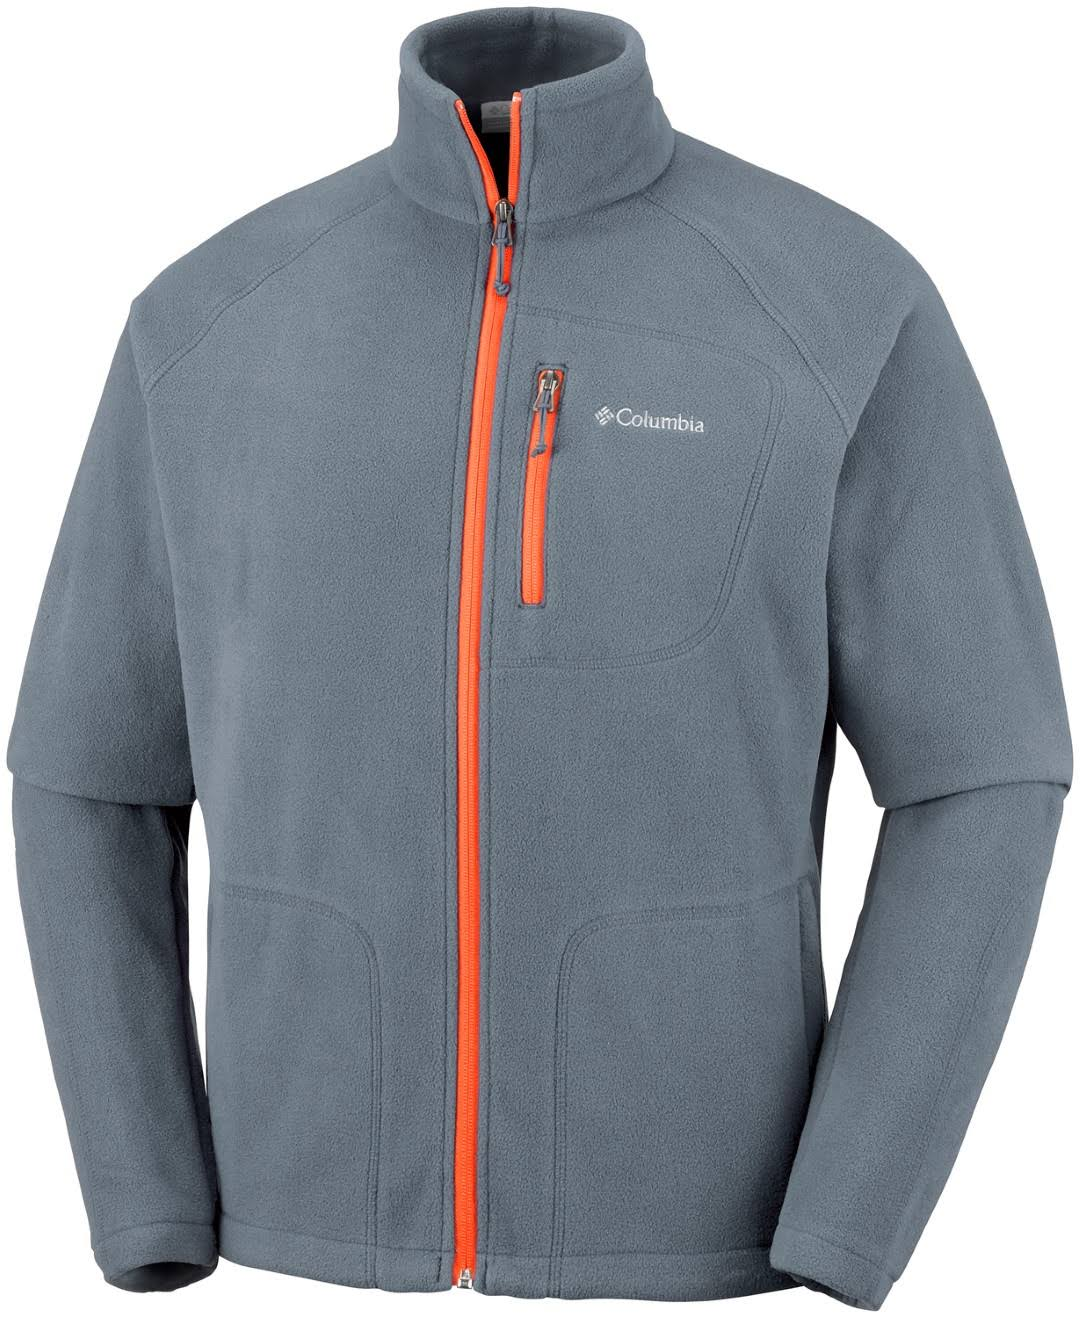 Backcountry Durchgehender Ii L Columbia Orange Fleece graphit Trek Fast fqAwnwBpY